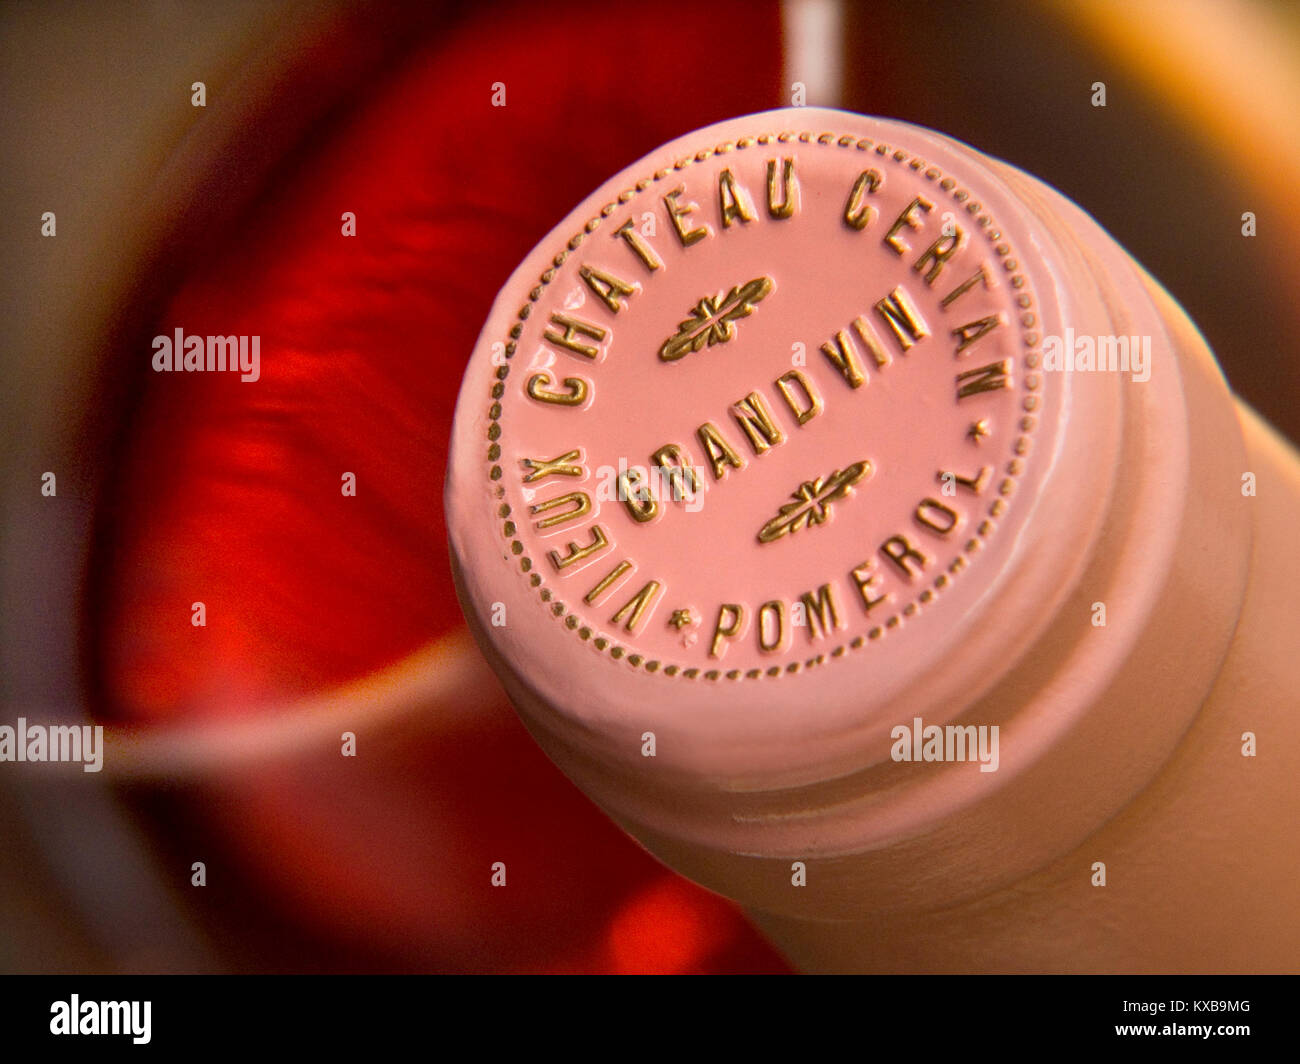 VIEUX CHATEAU CERTAN POMEROL close up embossed encapsulation wine bottle top name Fine Bordeaux Merlot red wine - Stock Image